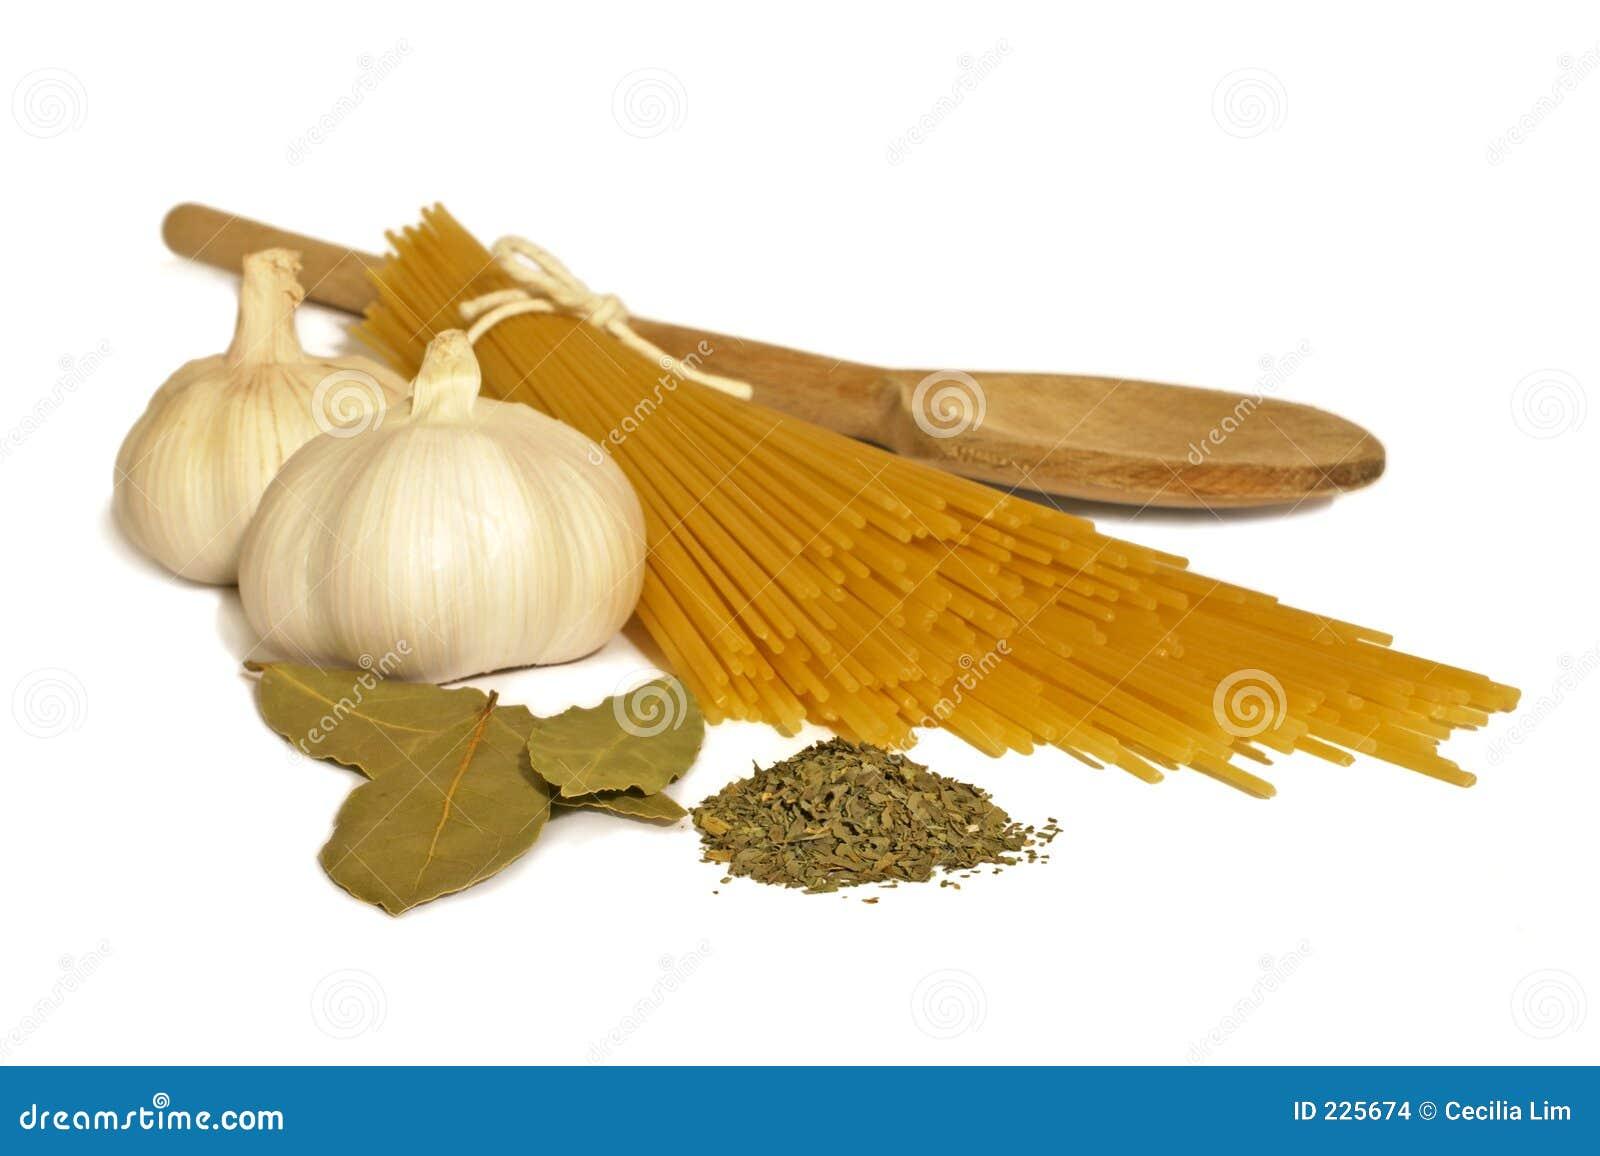 Cooking Pasta